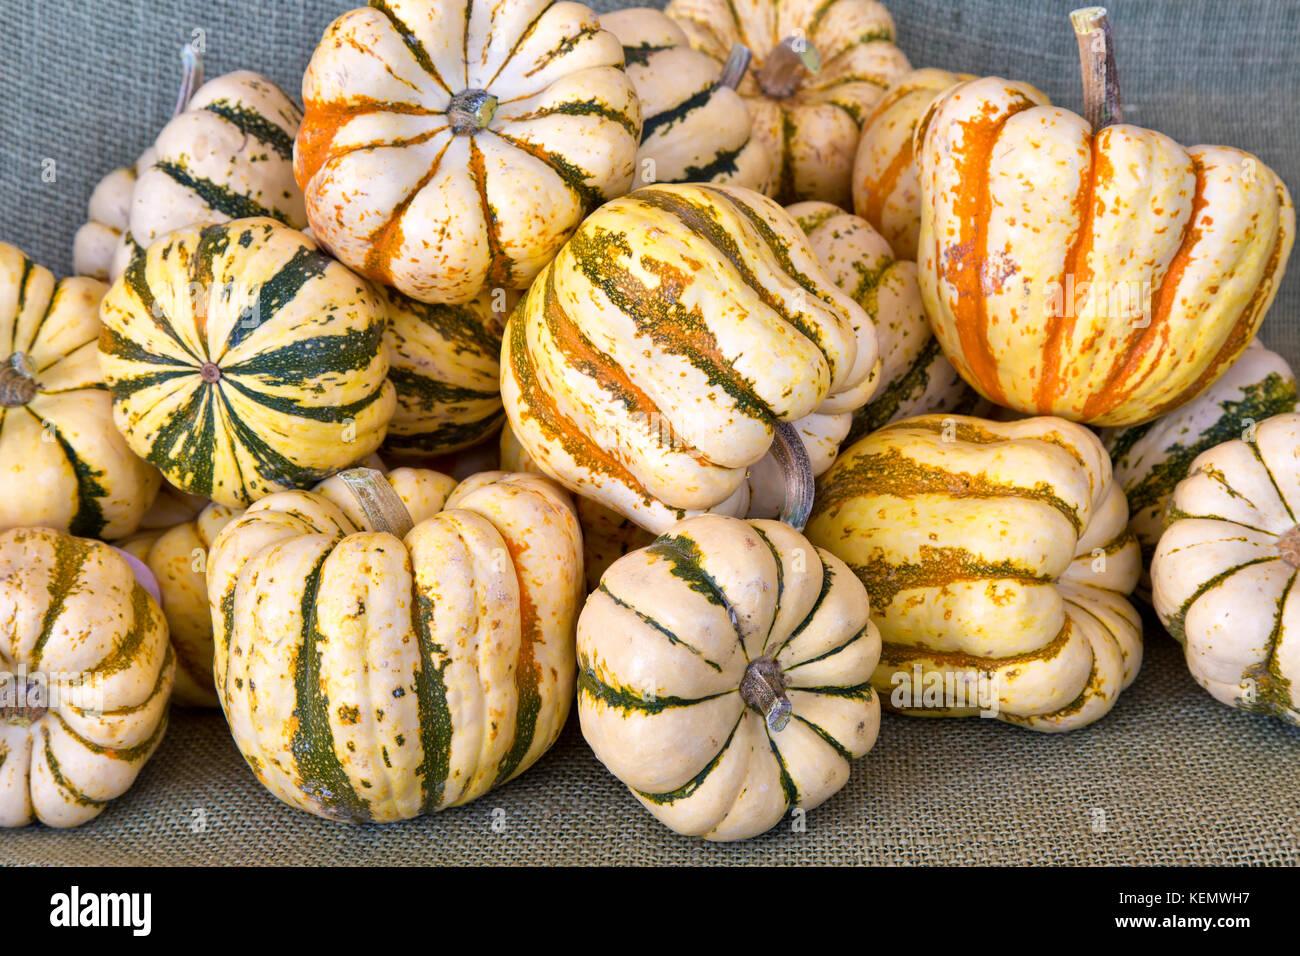 Harvested Carnival & Sweet Dumpling' squash. - Stock Image